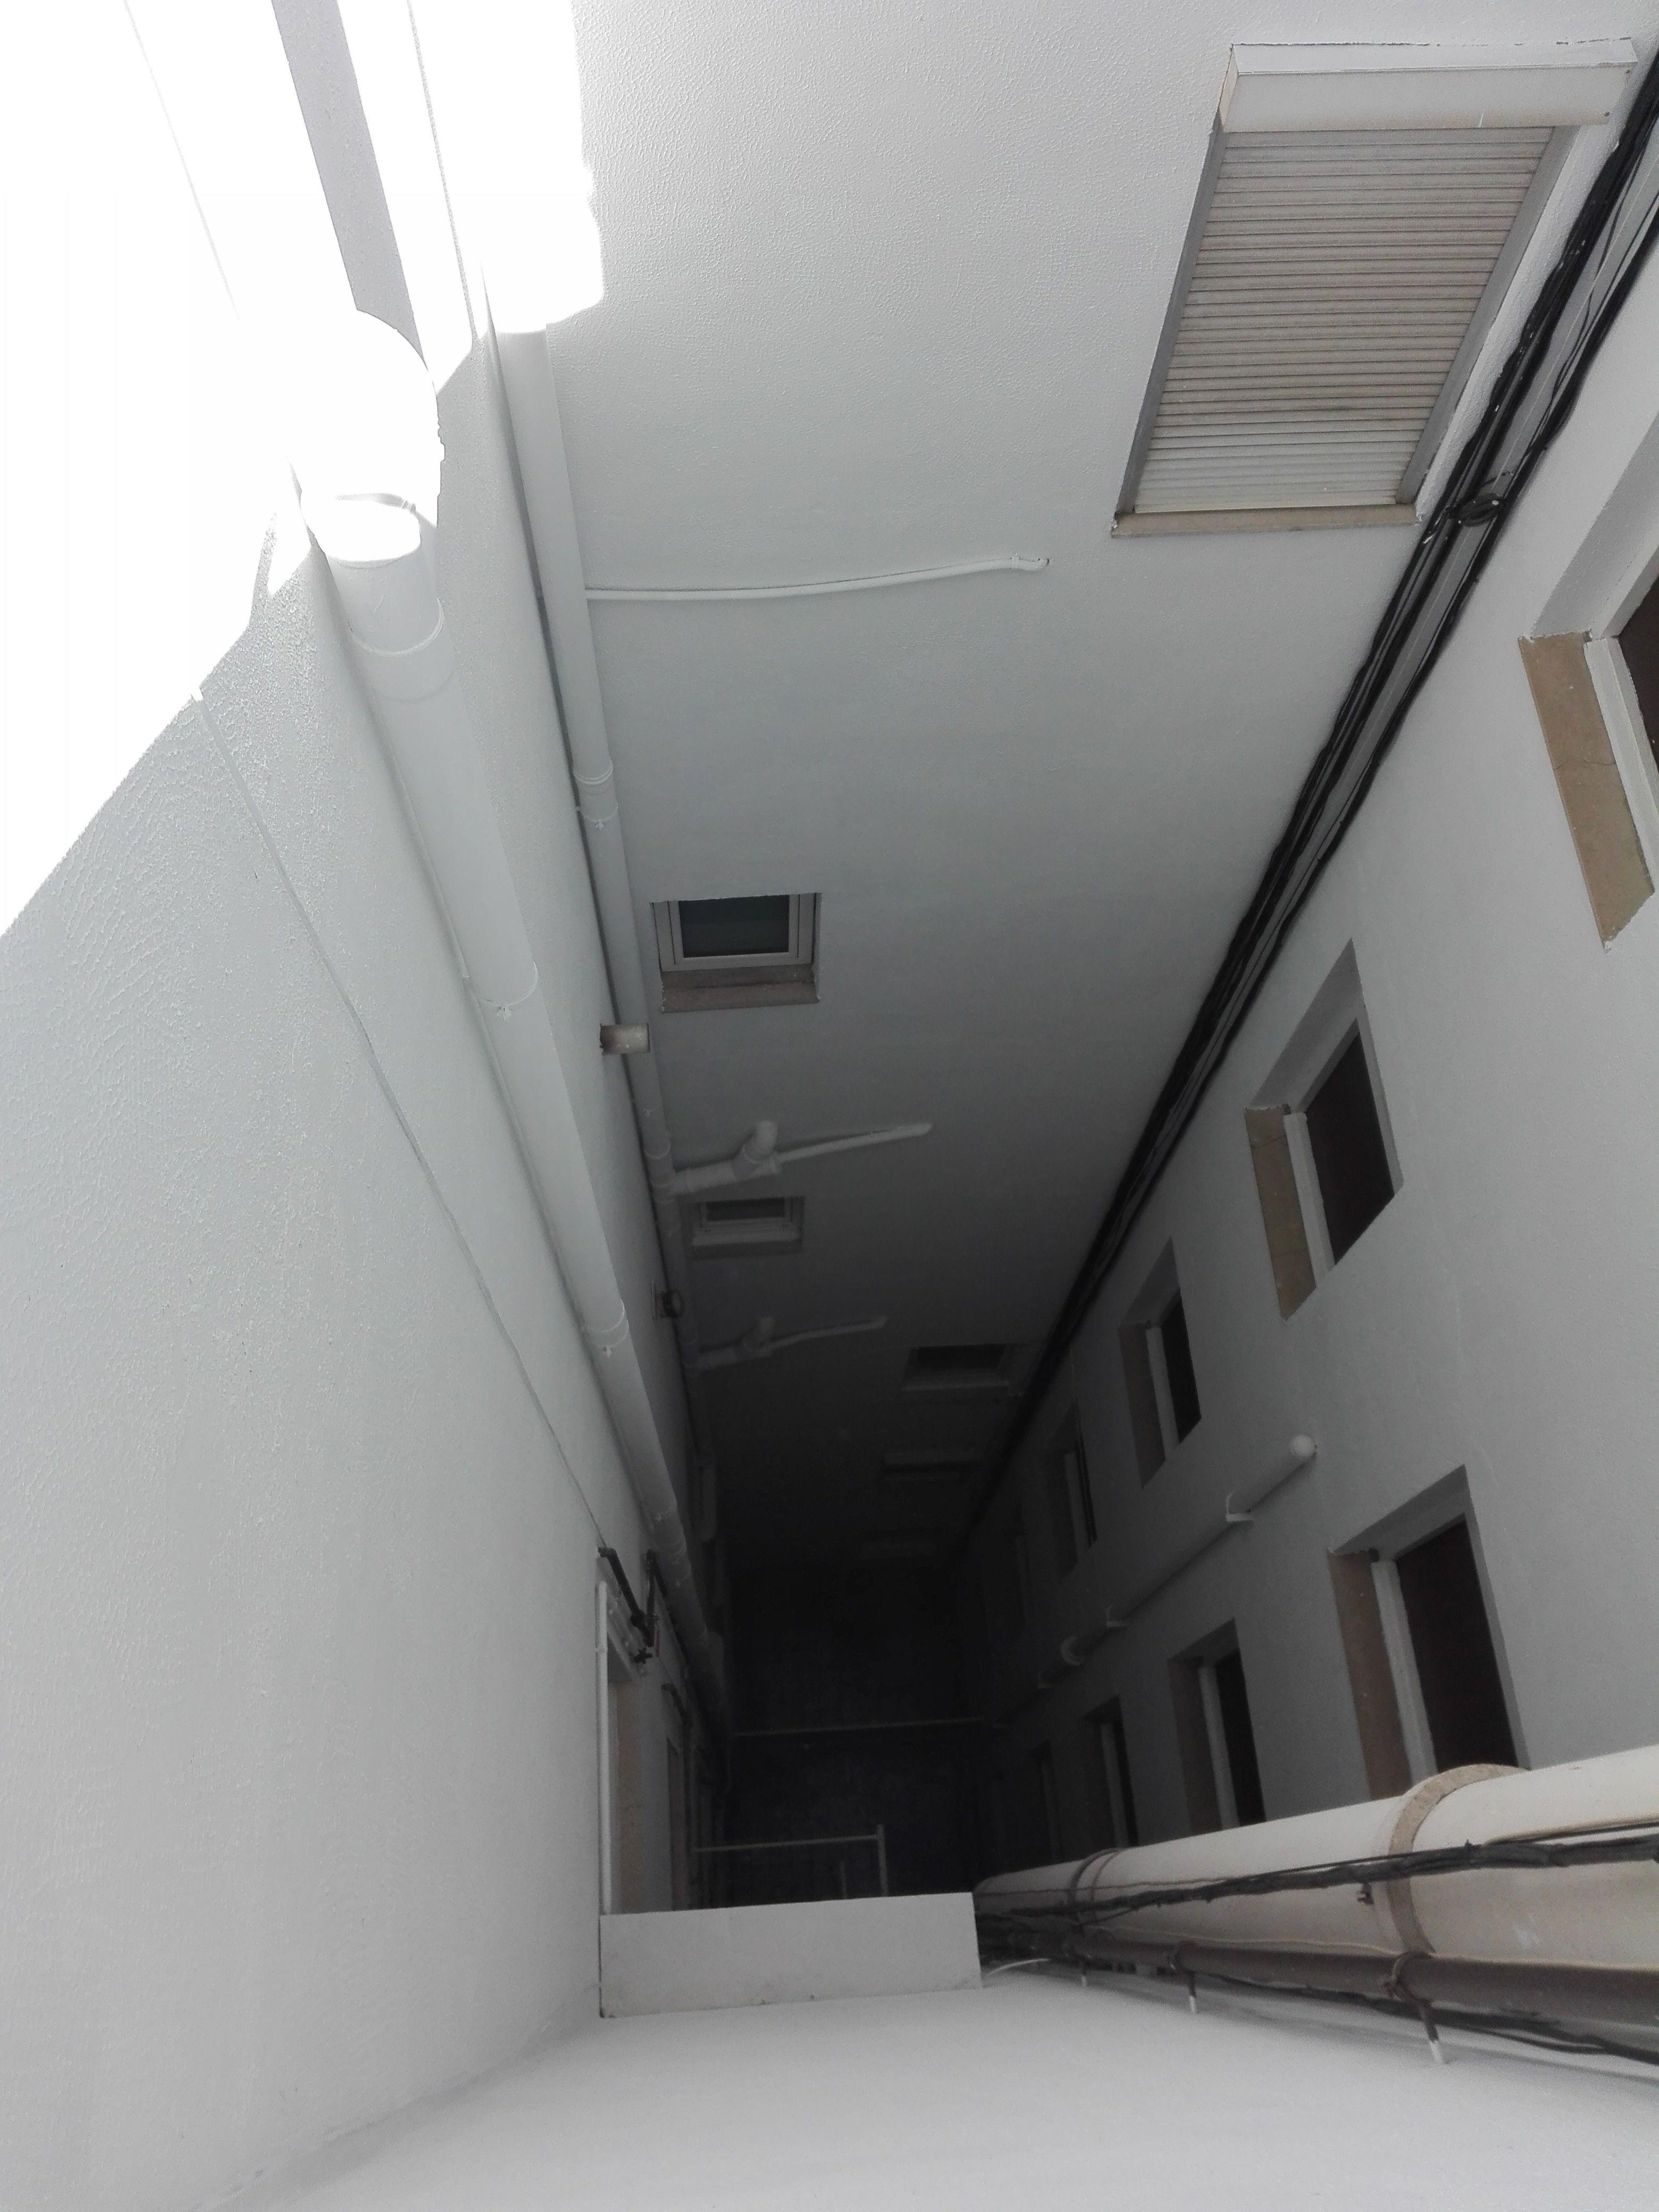 Rehabilitación de patios de luces en Granollers